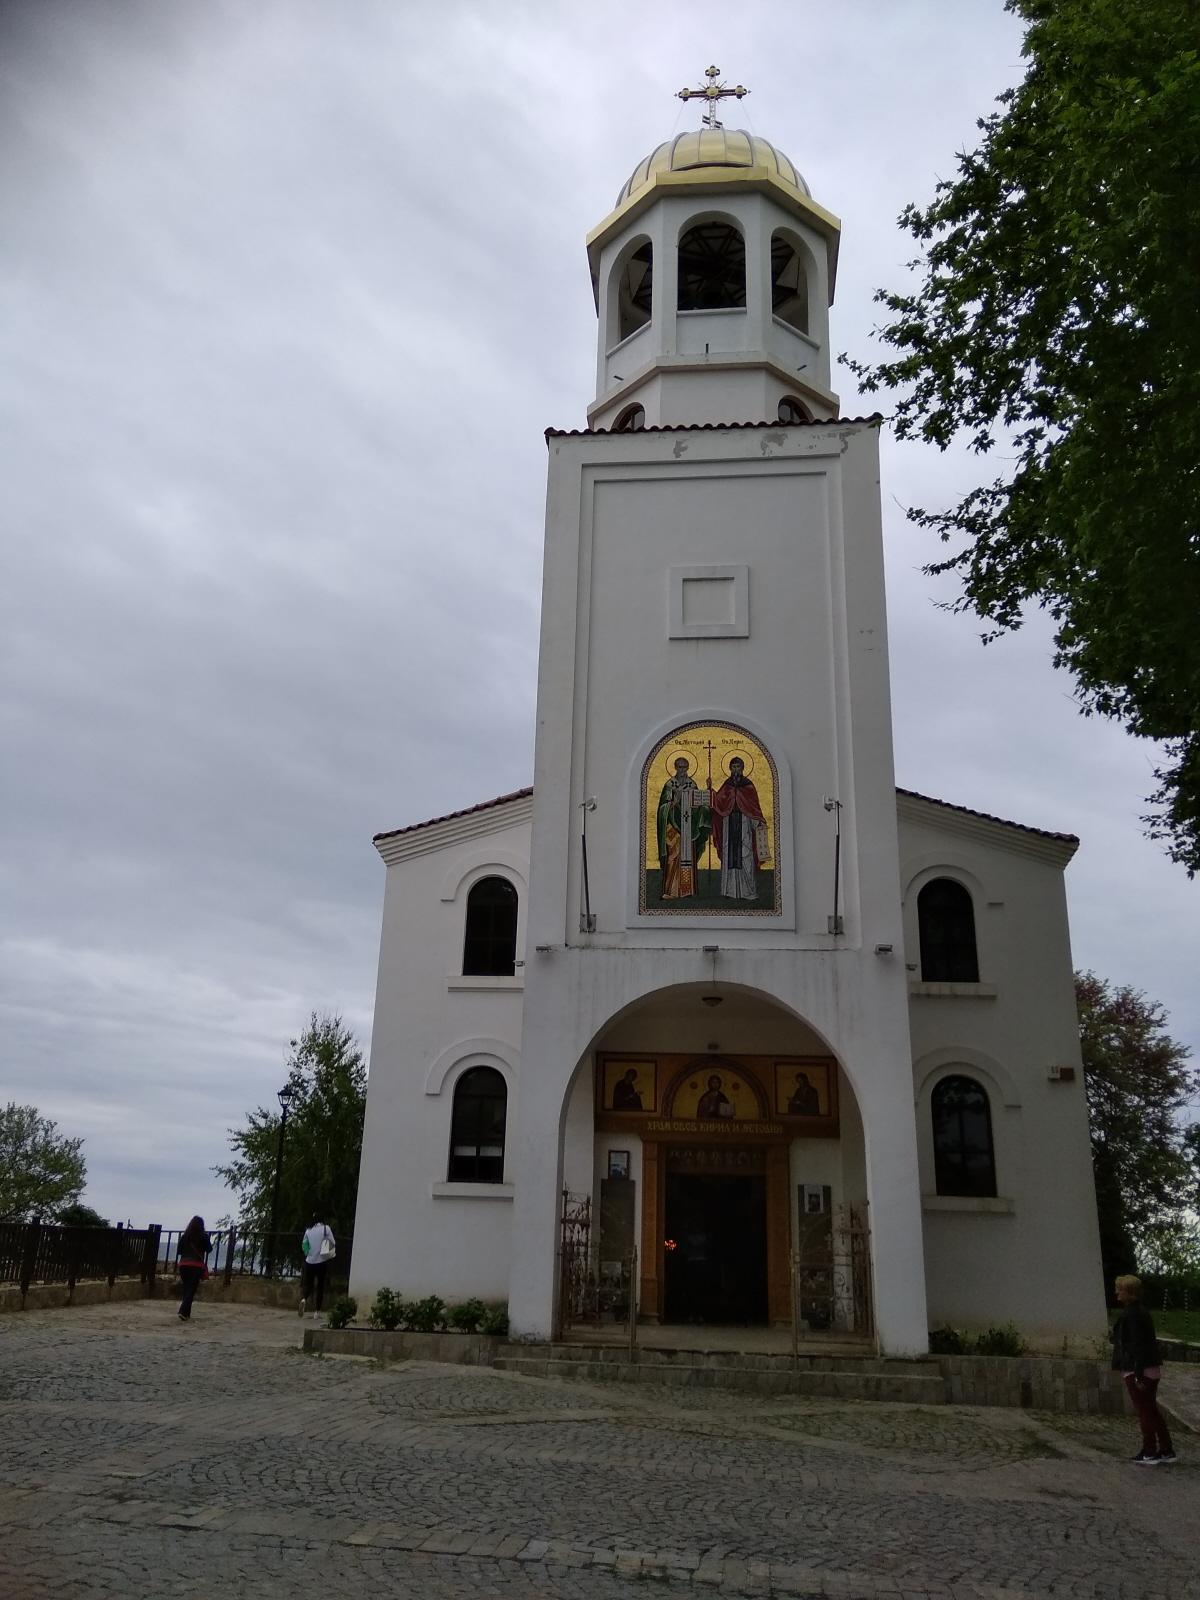 Sozopol. Stare domy w starym mieście